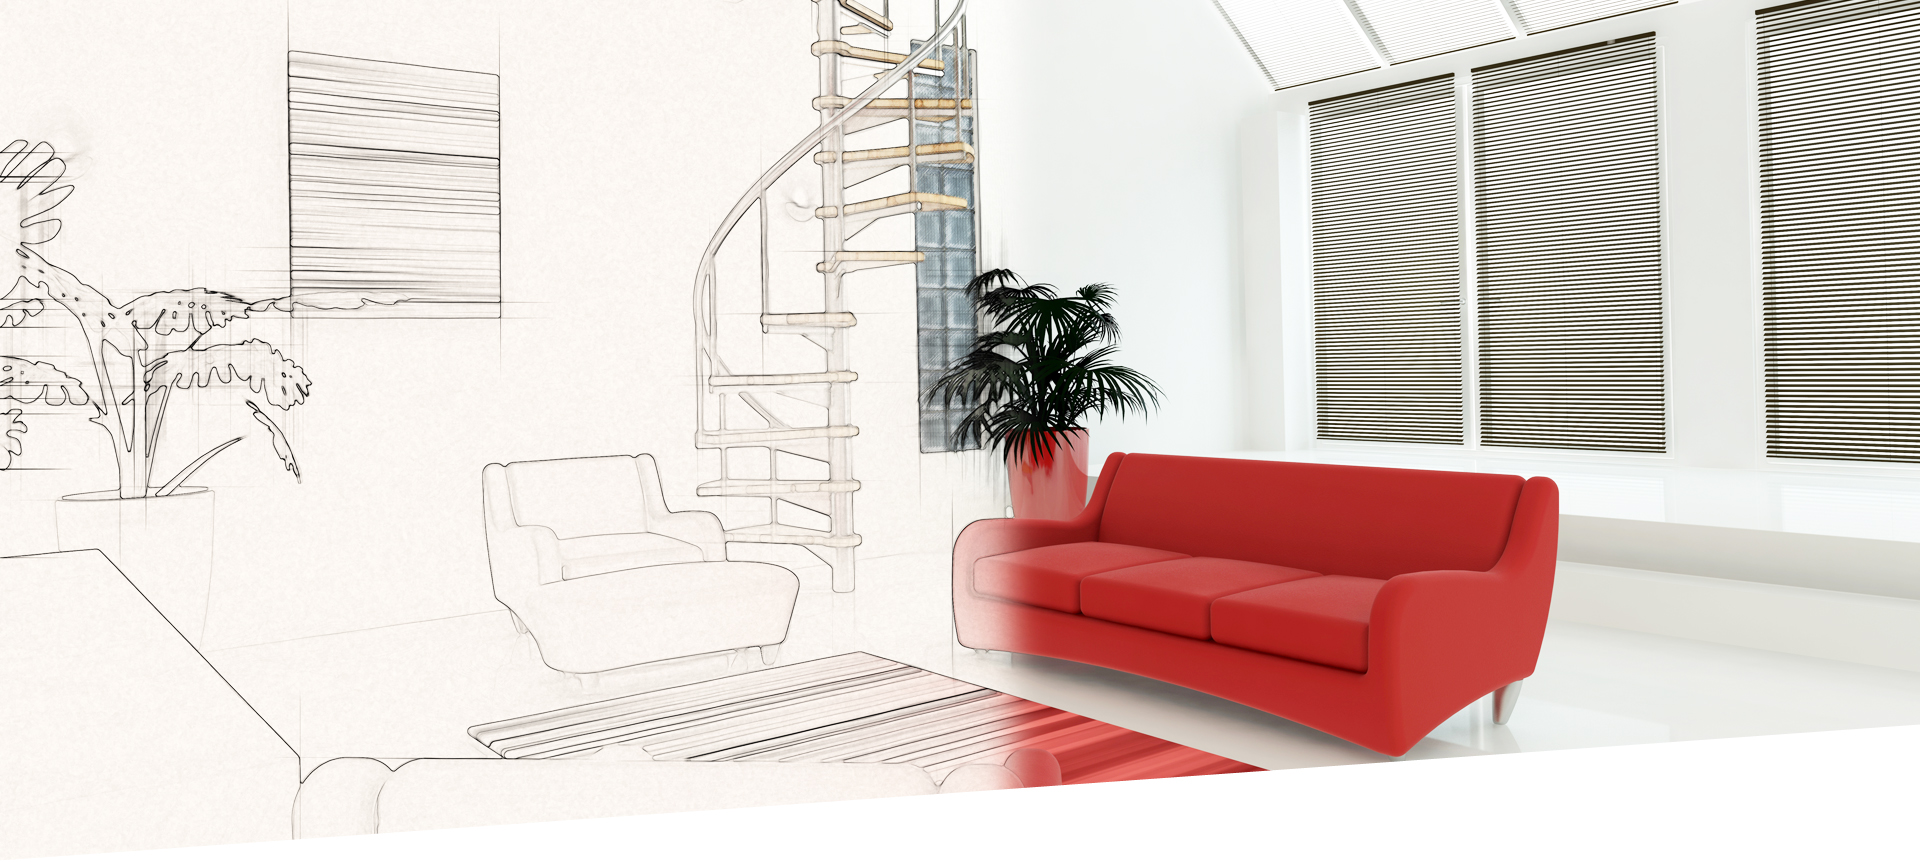 Proyectos Integrales en Original Furniture